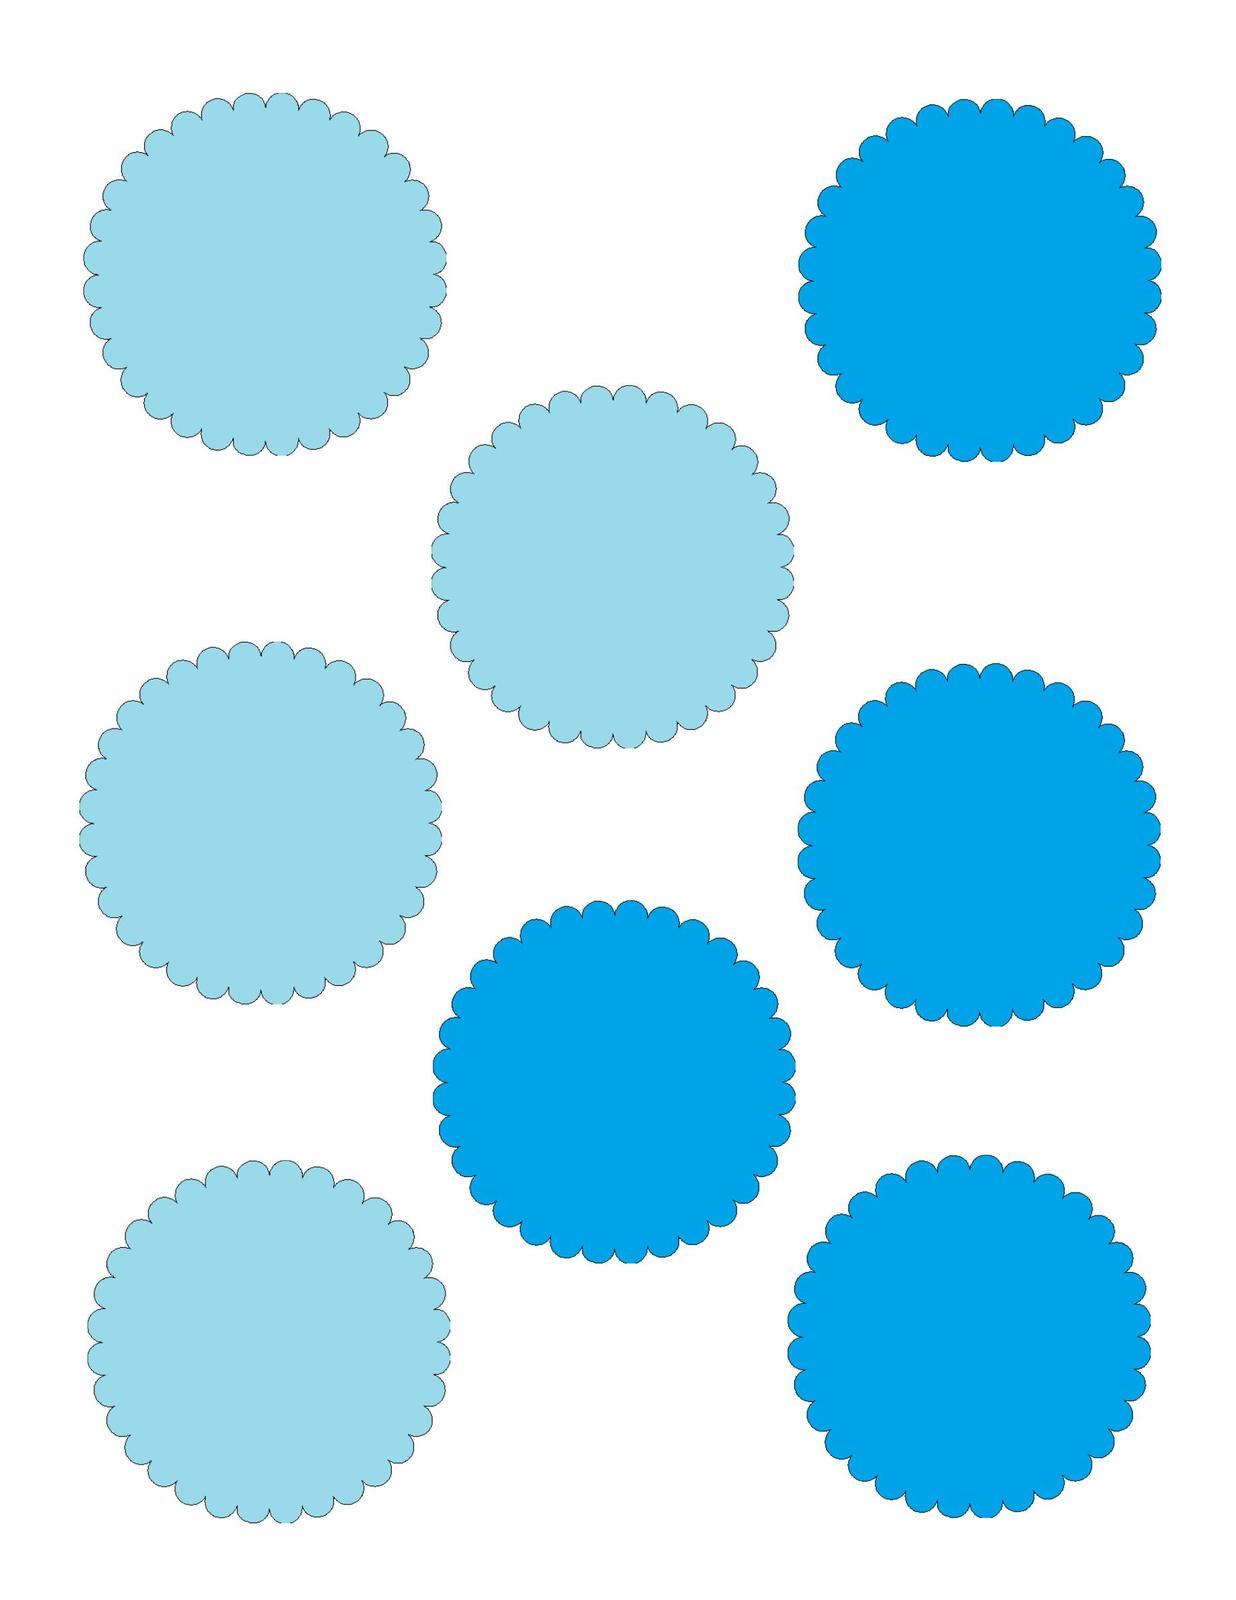 Scallop circles 7